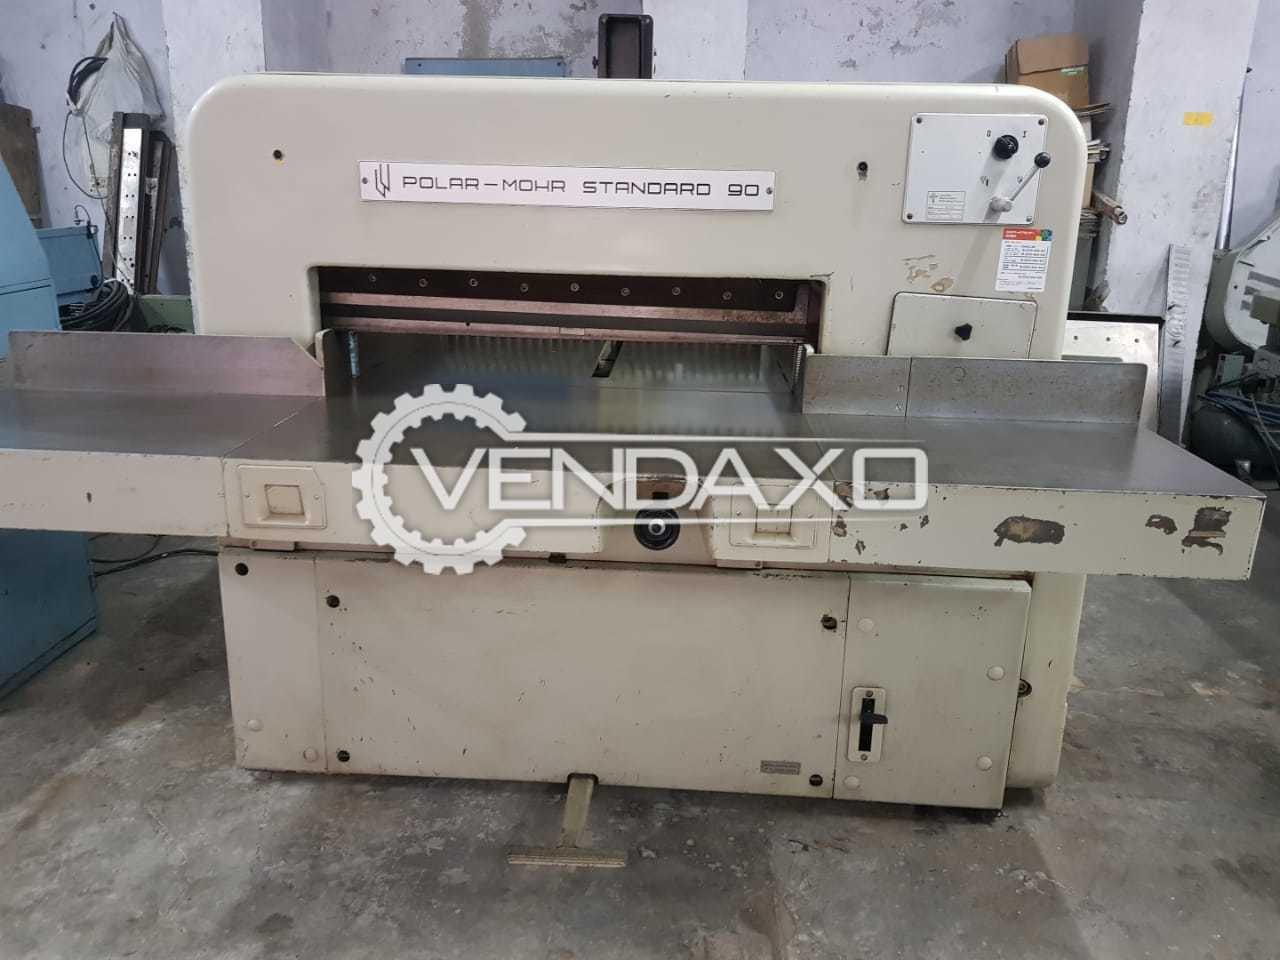 Polar 90 CS Paper Cutting Machine - Size - 35.5 Inch